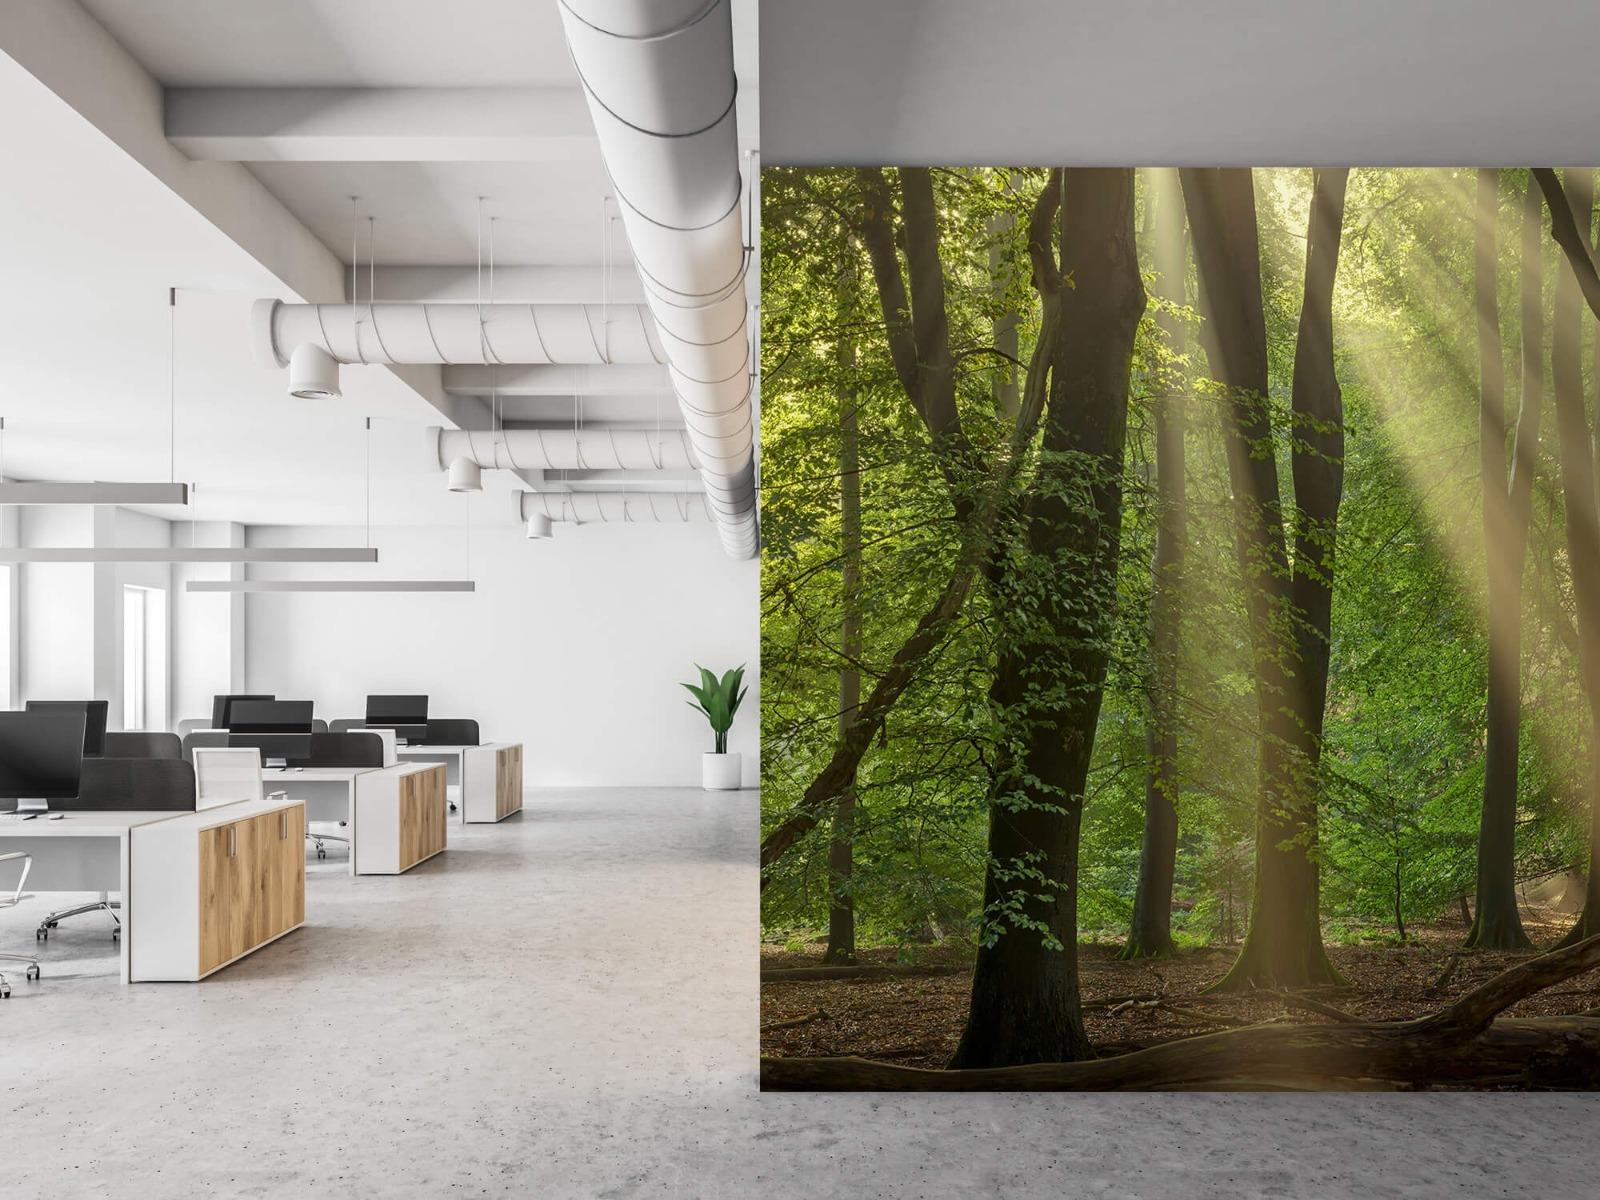 Bomen - Zonneharpen in het bos - Slaapkamer 21